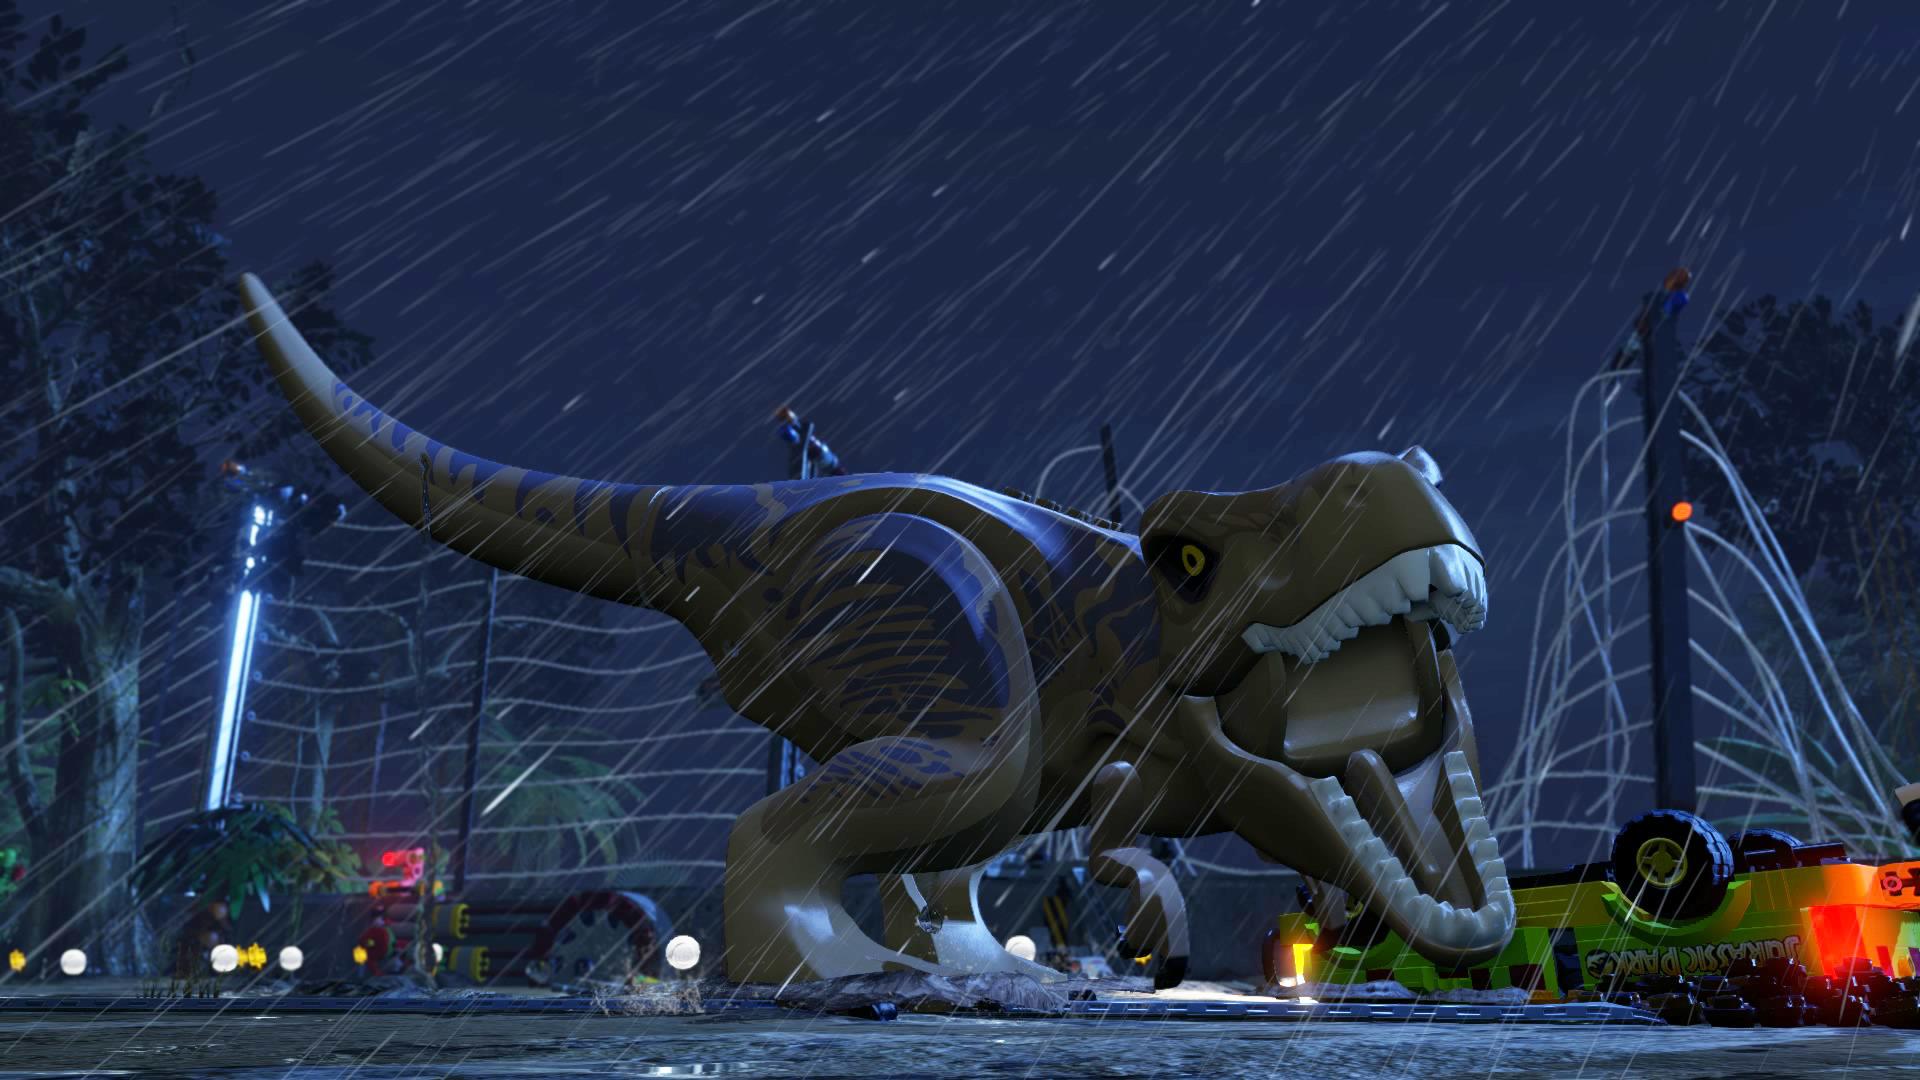 Imagen - Lego-jurassic-world-t-rex.jpg   Jurassic Park Wiki   FANDOM ...